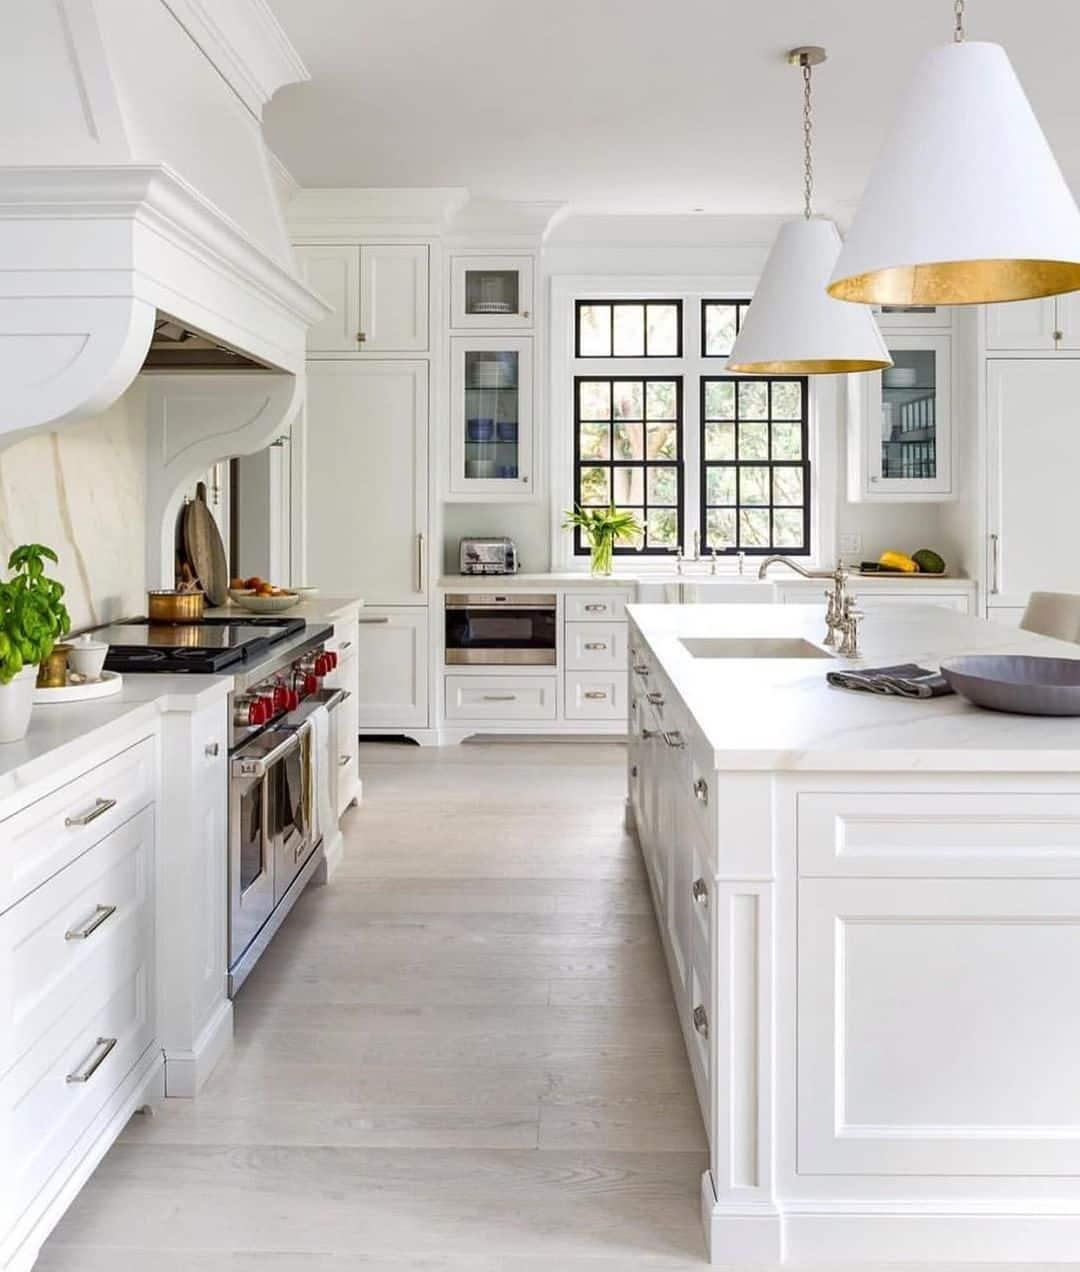 30 Best Kitchen Designs In South Africa 2020 Photo Gallery